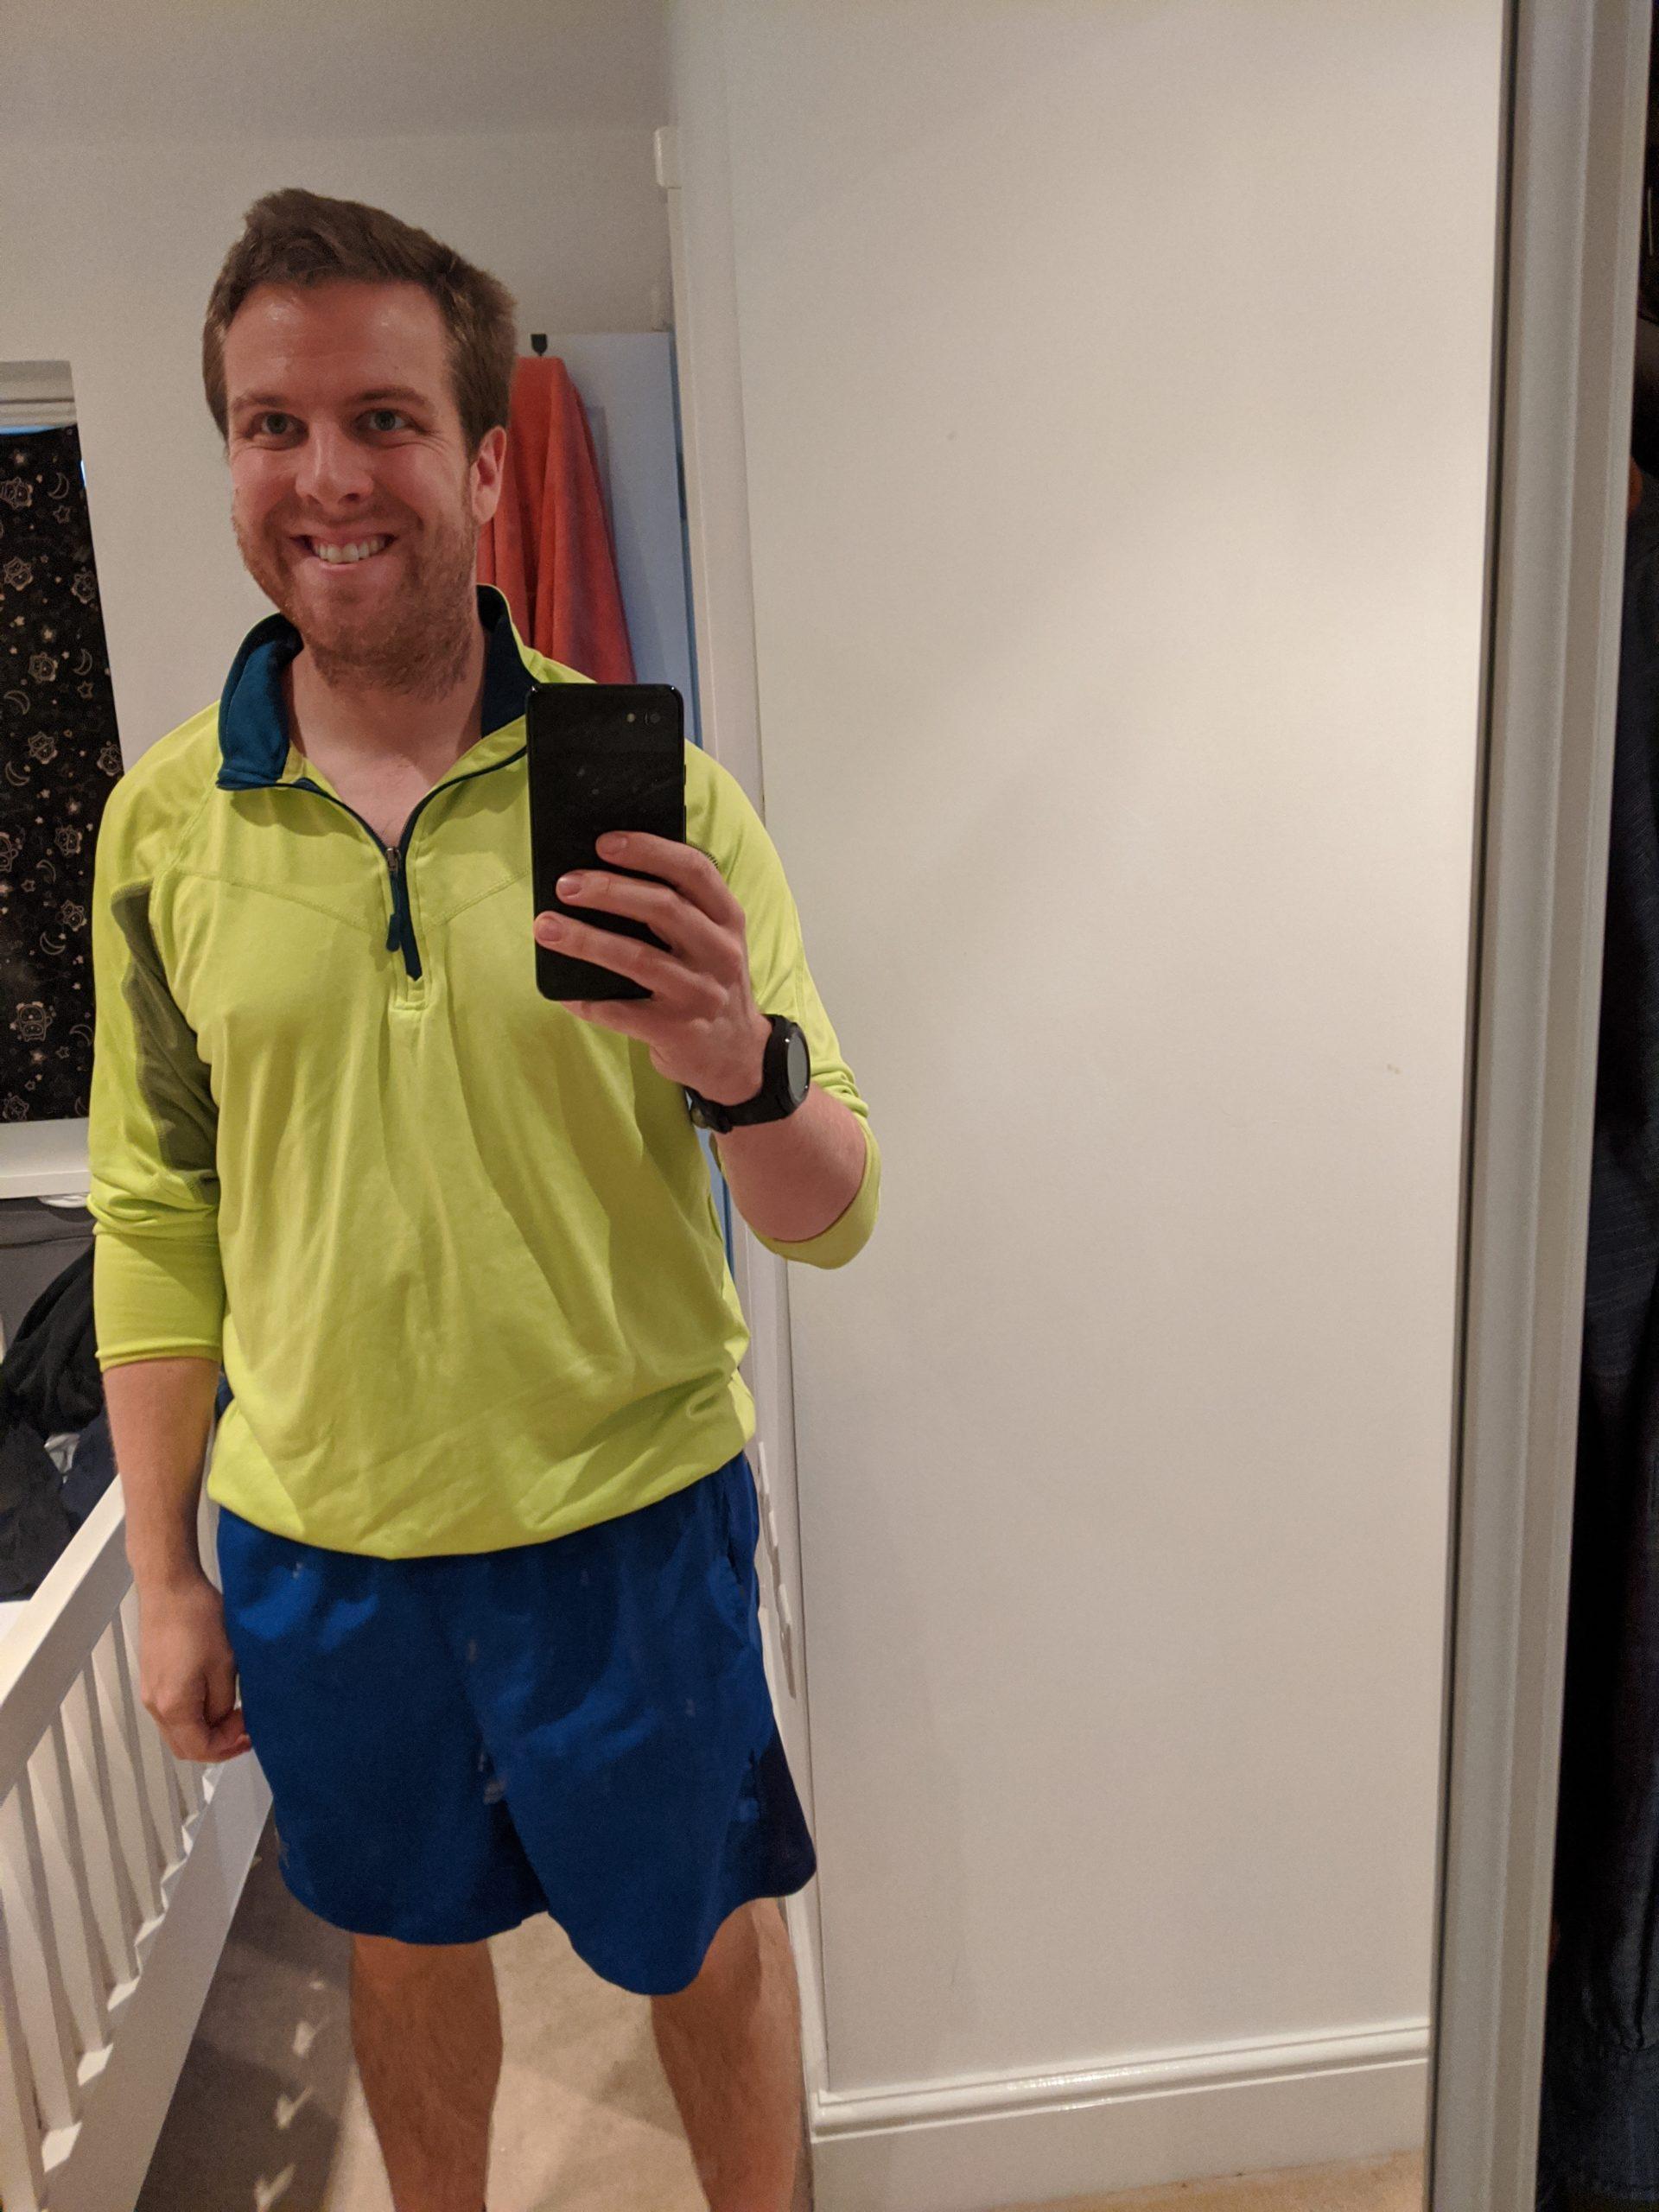 Oli Hiscoe in running gear